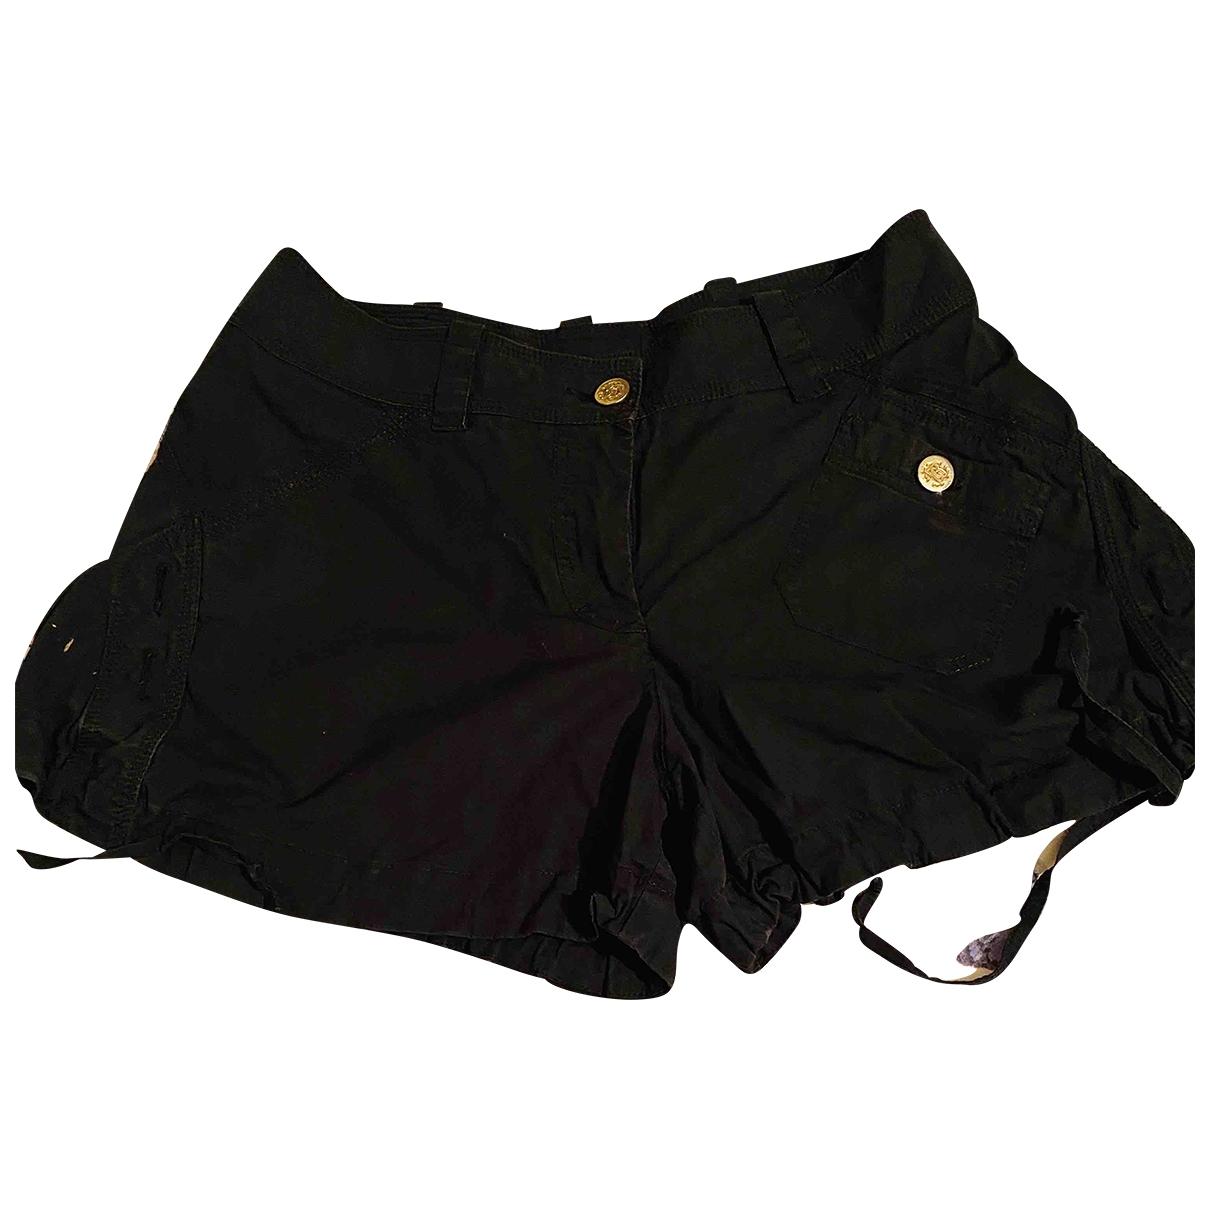 Roberto Cavalli \N Black Cotton Shorts for Women 40 IT